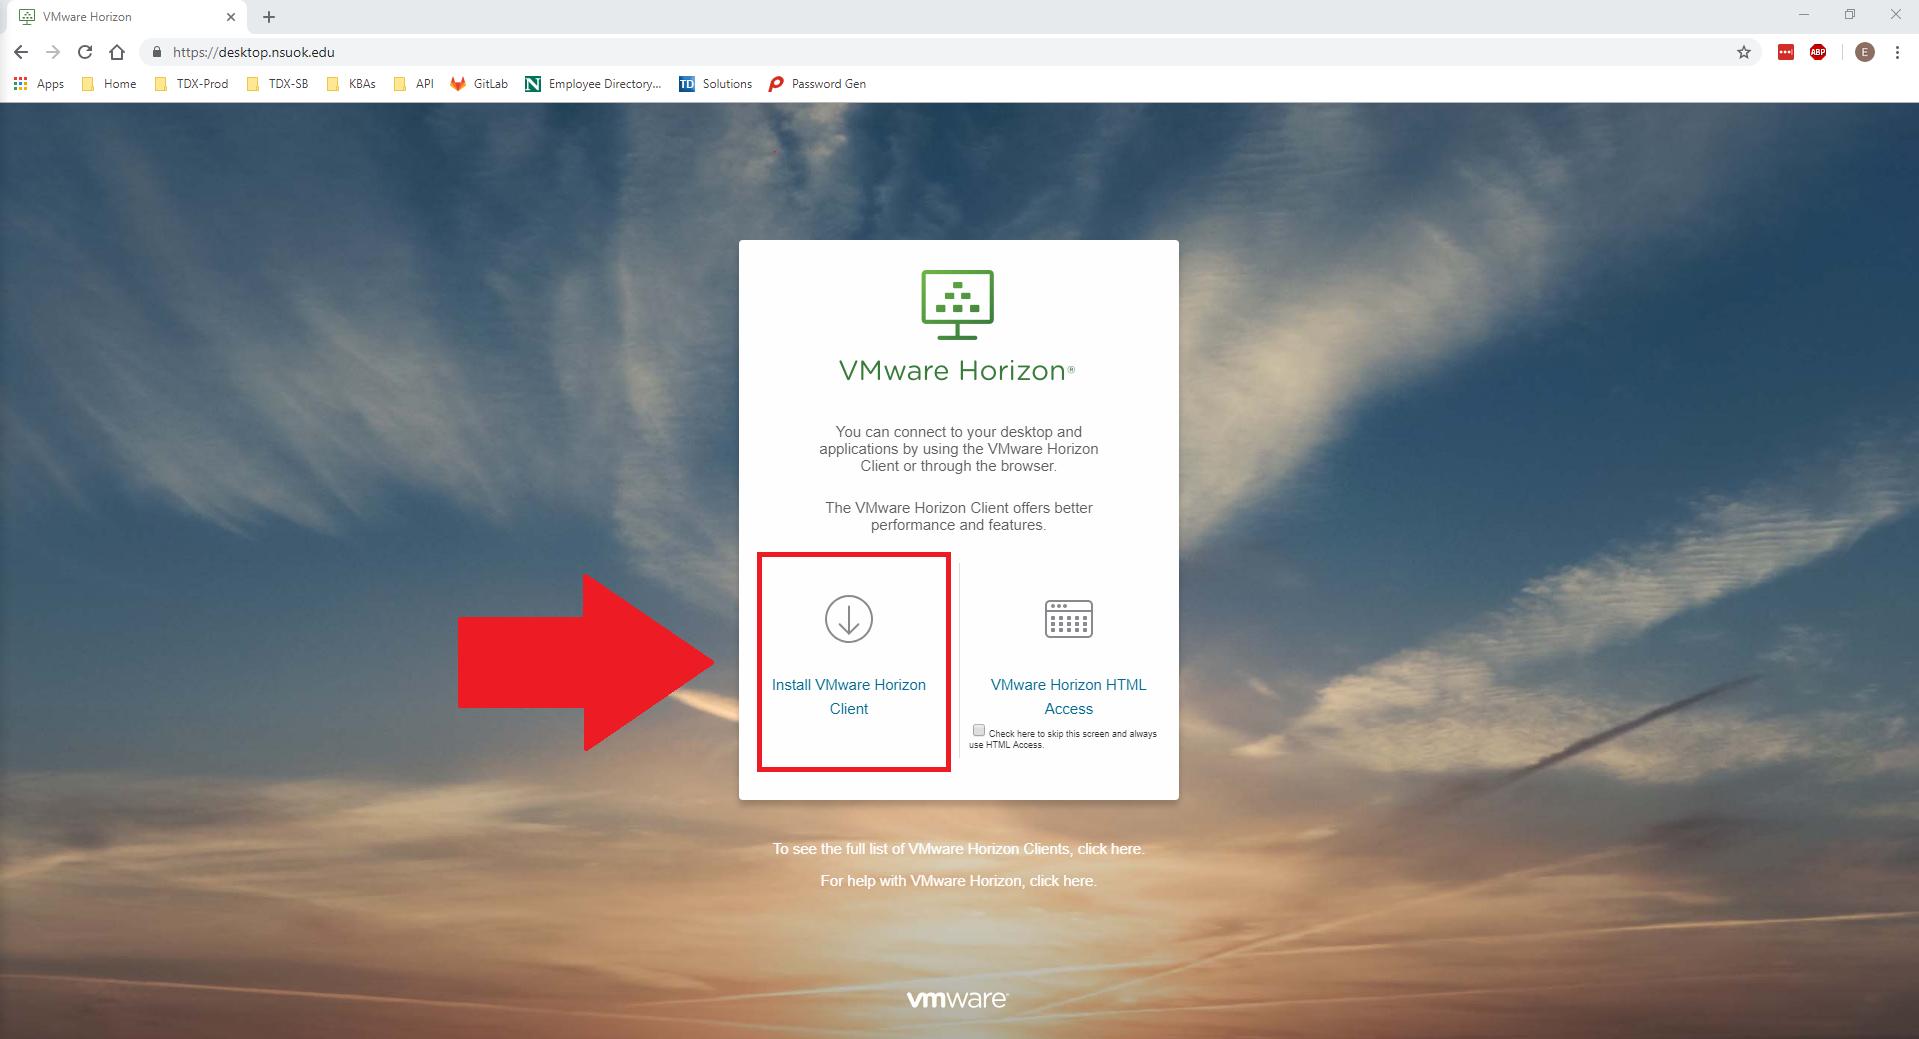 Install VMWare Horizon Client